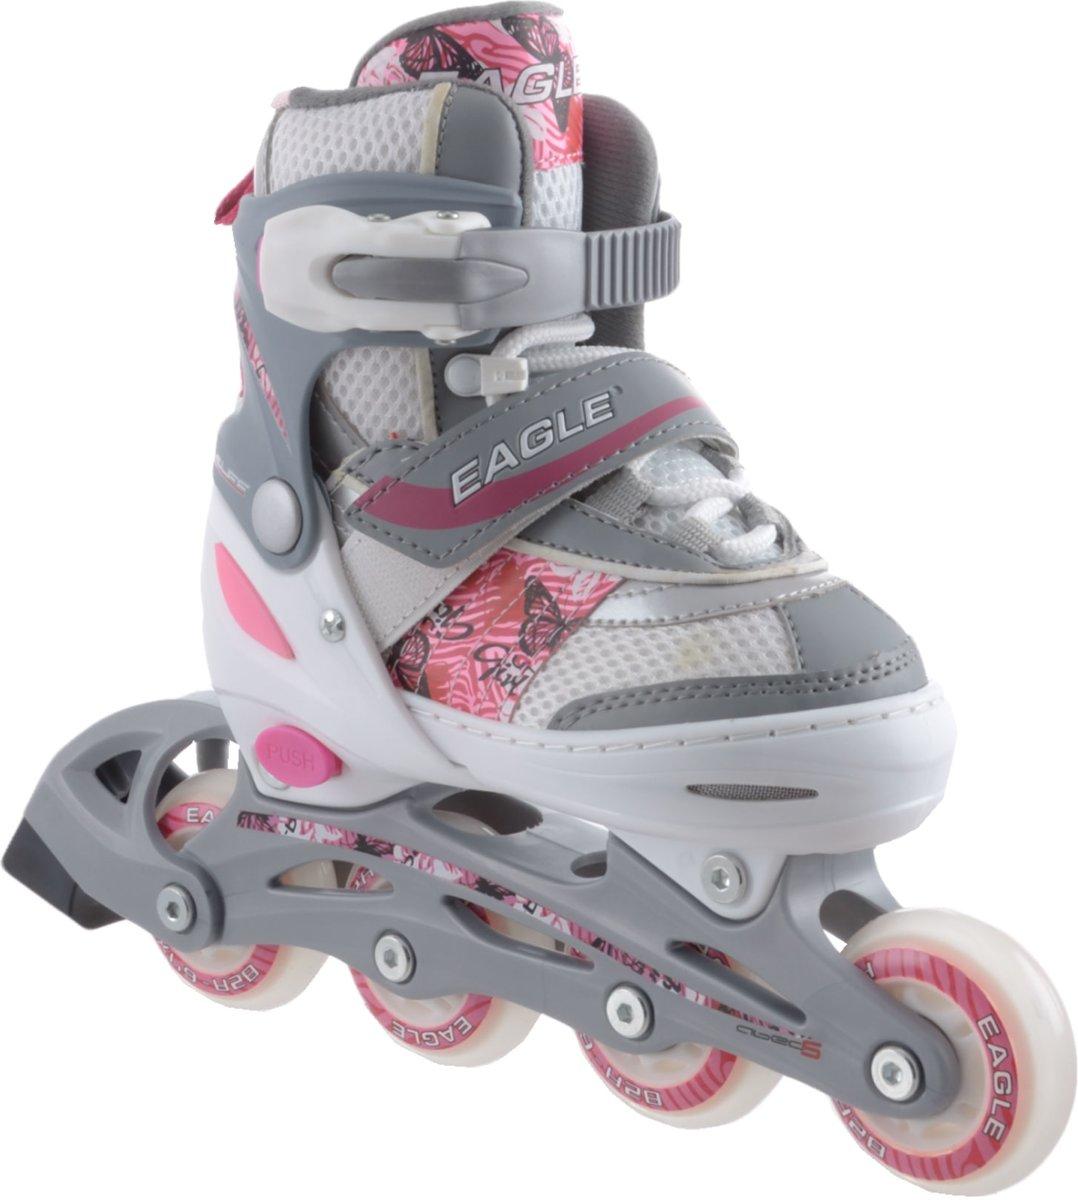 Wonderbaar bol.com   Inline Skates Combo Roze - Maat 30-33 LH-22